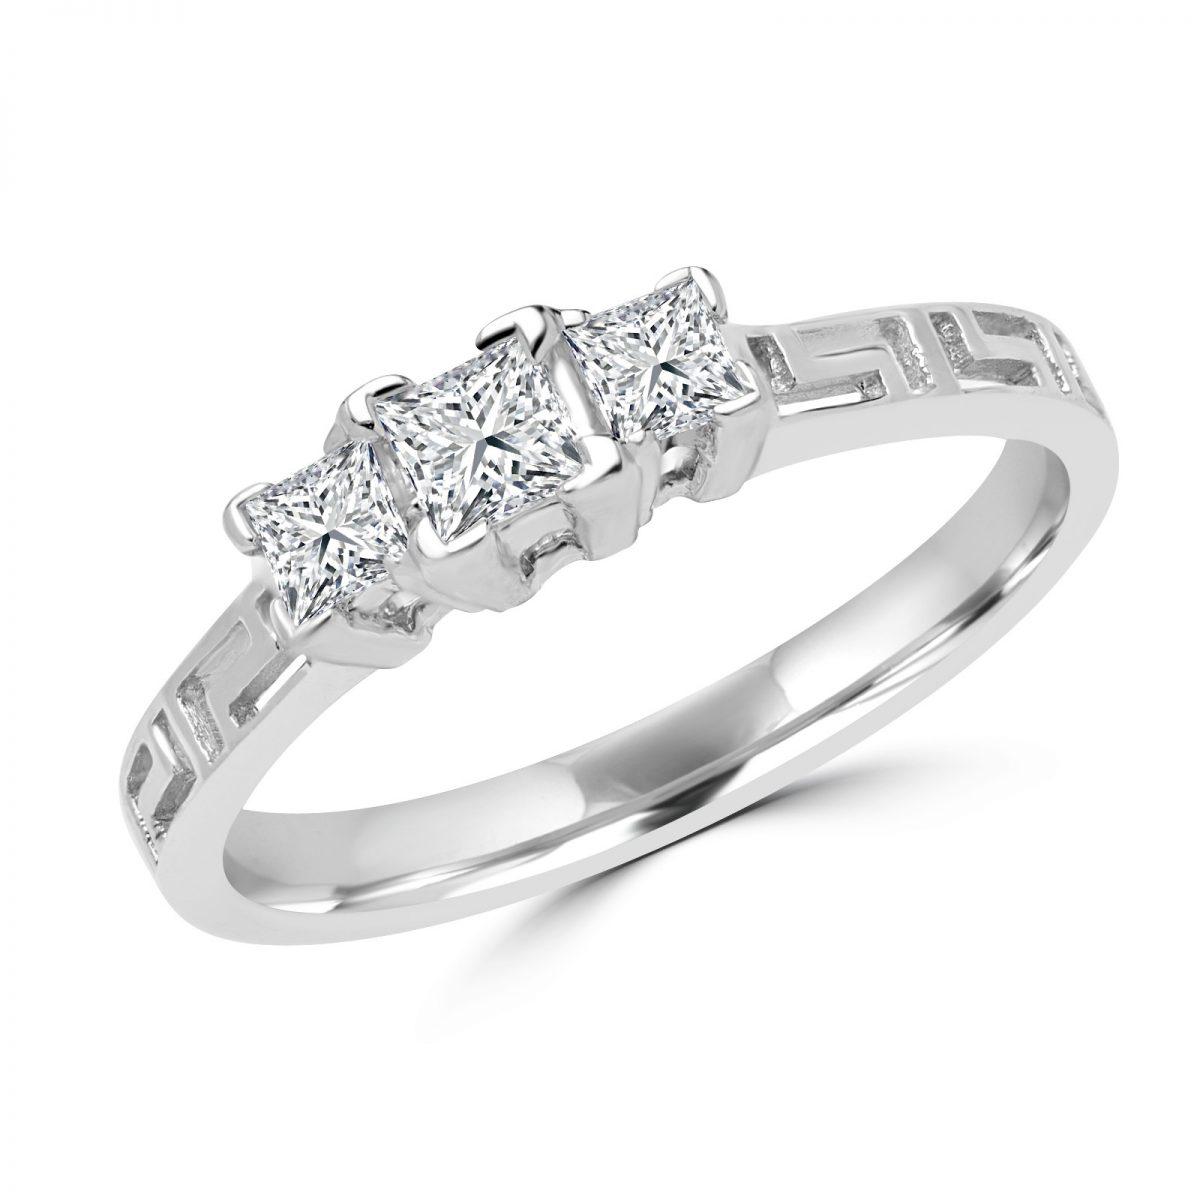 0 36 Carat Ctw Princess Cut Diamond Engagement Three